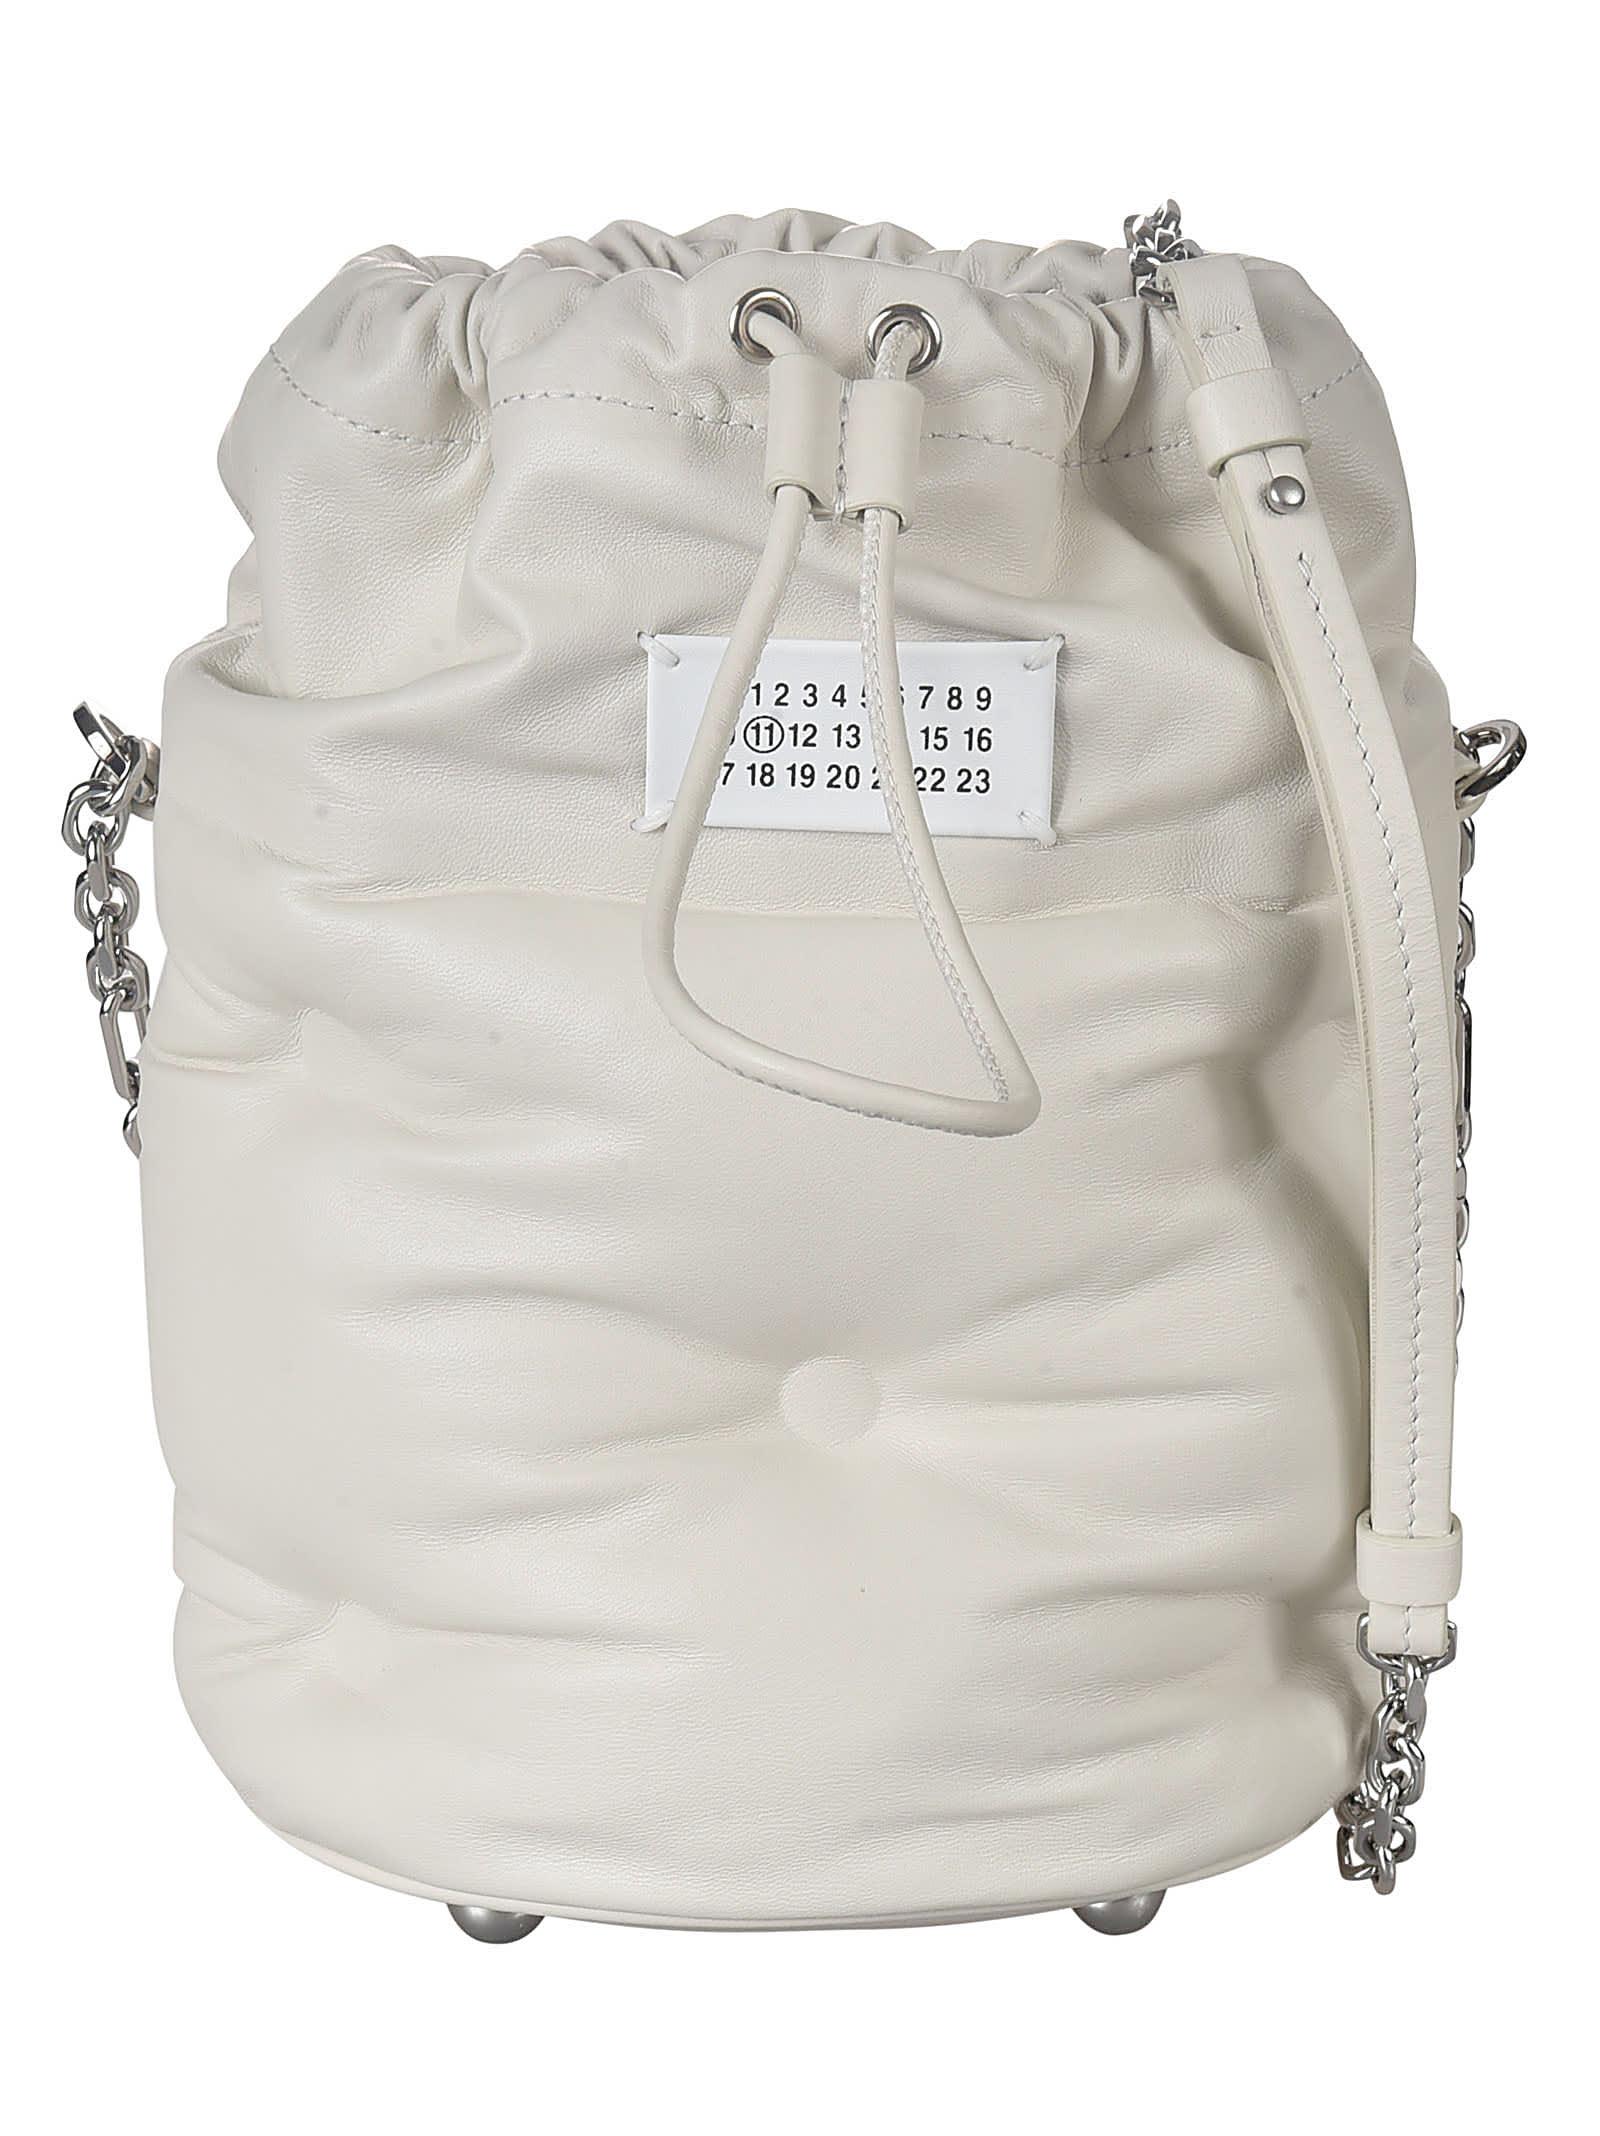 Maison Margiela Chain Bucket Bag